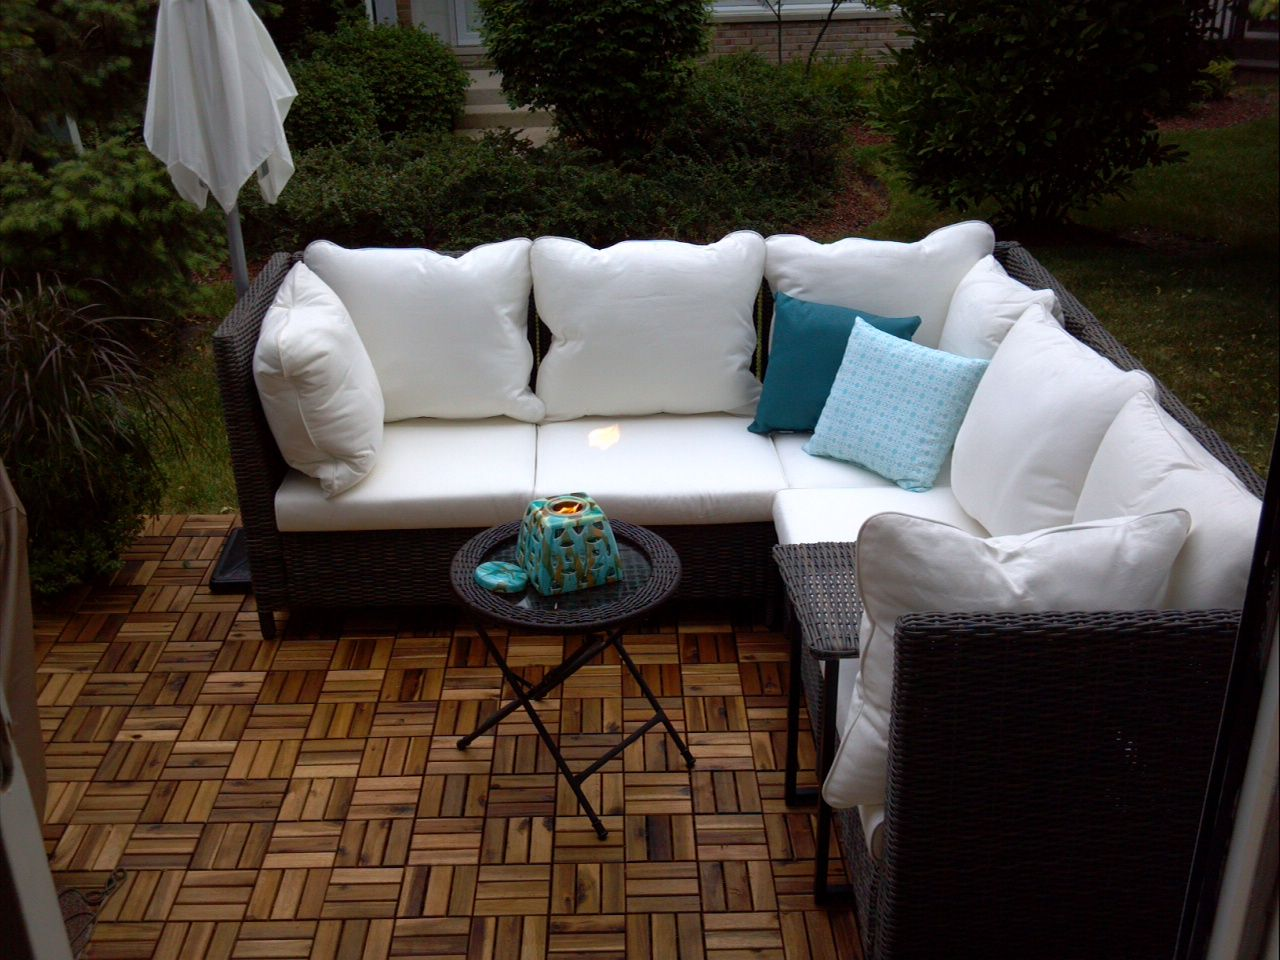 I transformed my ordinary 8x10 concrete patio into a